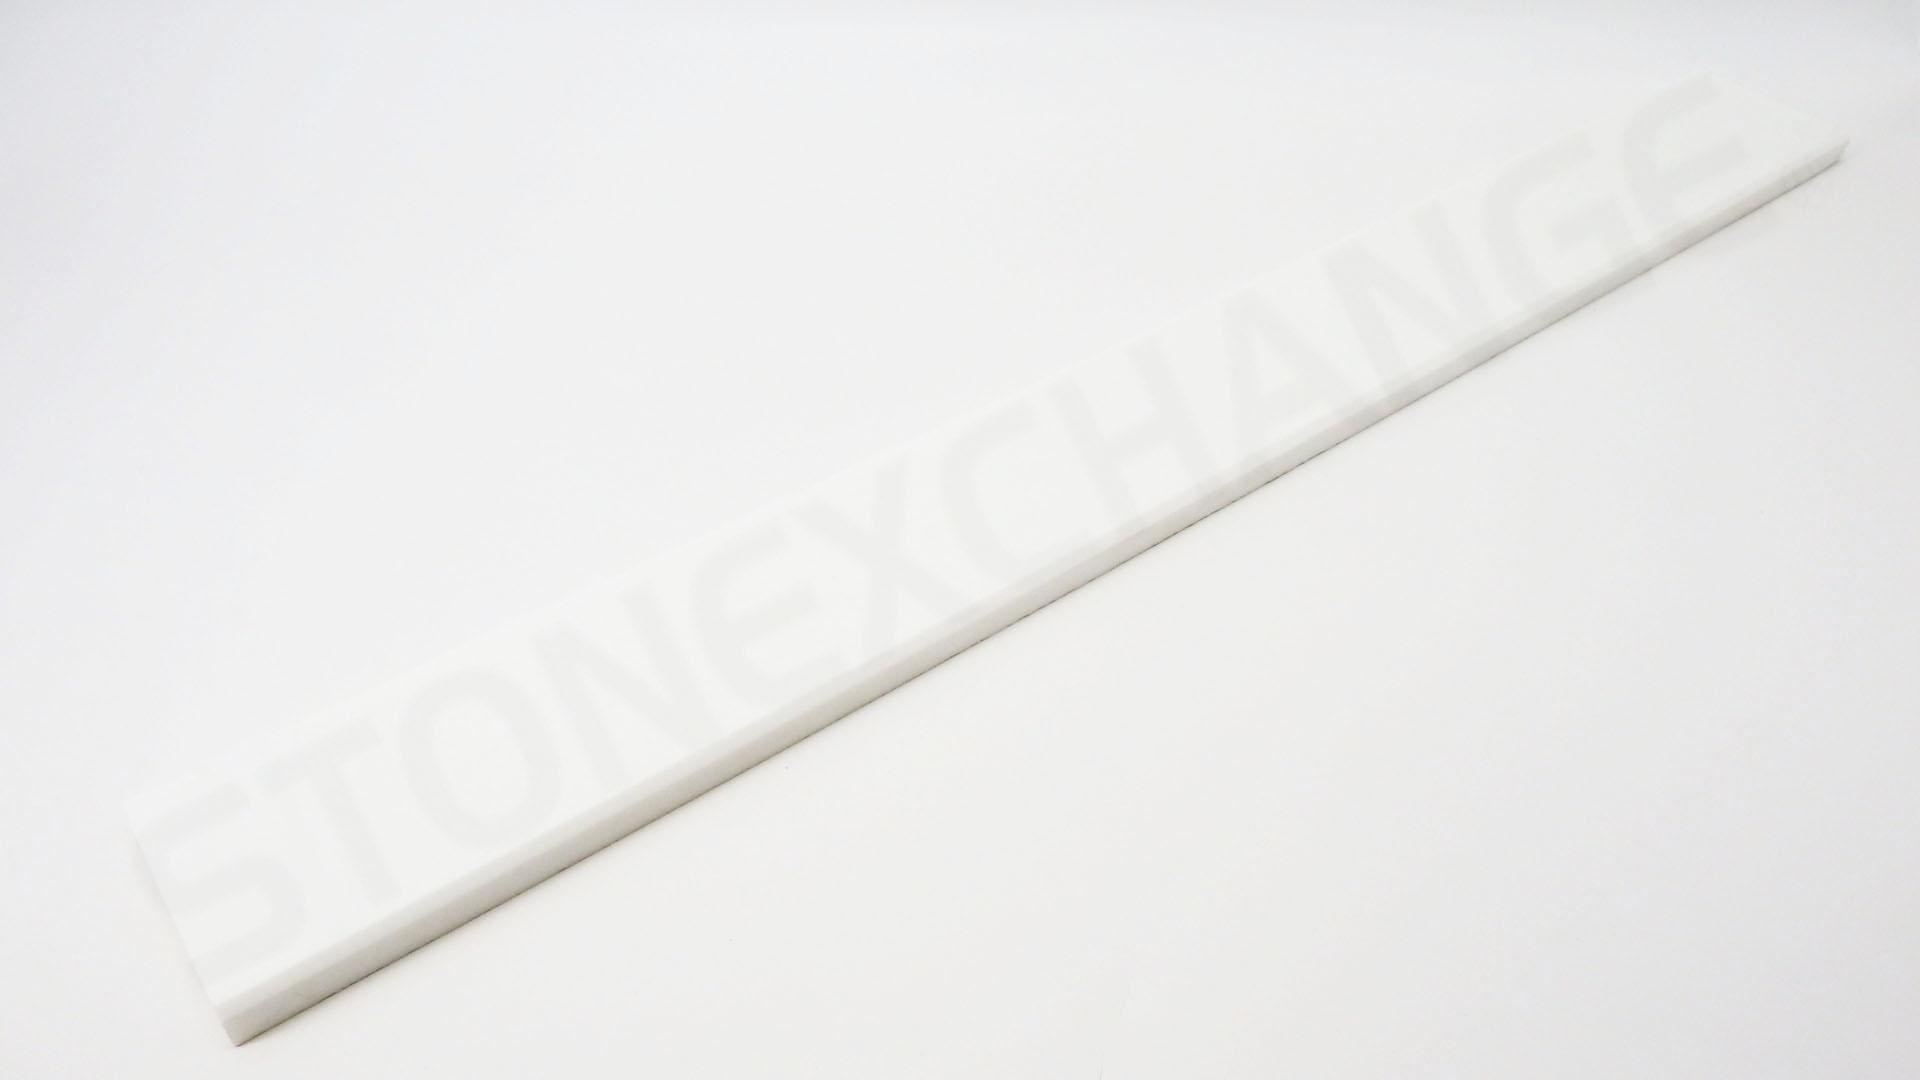 Pure White Engineered Stone 4x36 Standard Double Bevel Threshold